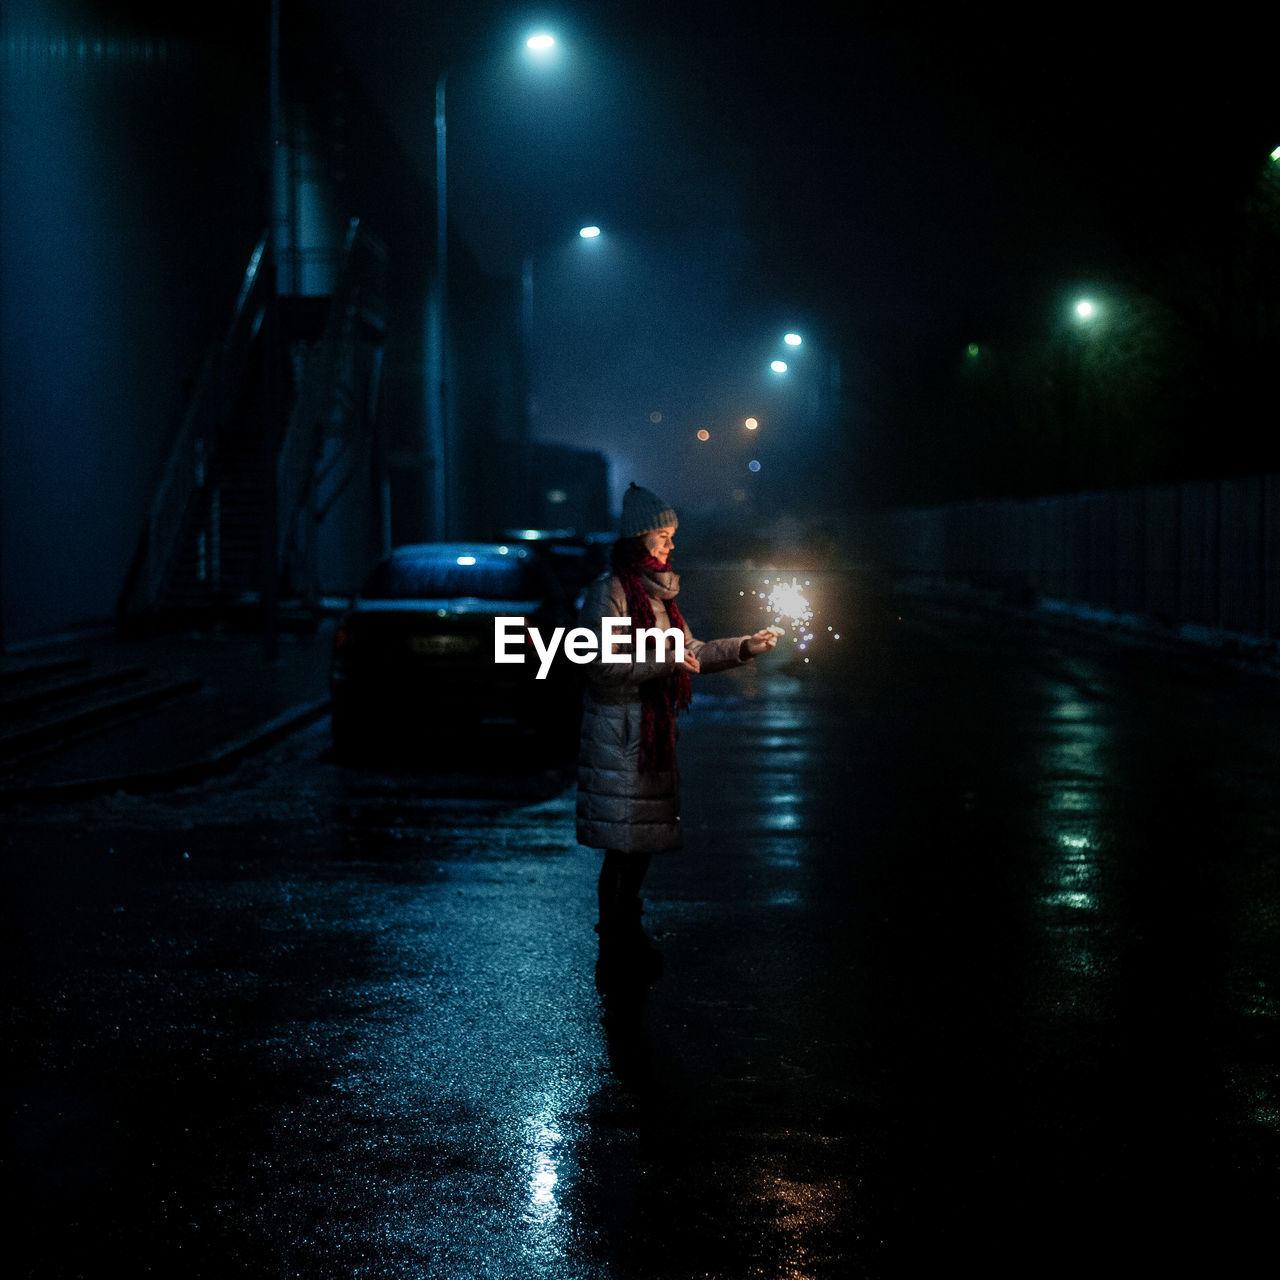 MAN STANDING IN ILLUMINATED NIGHT